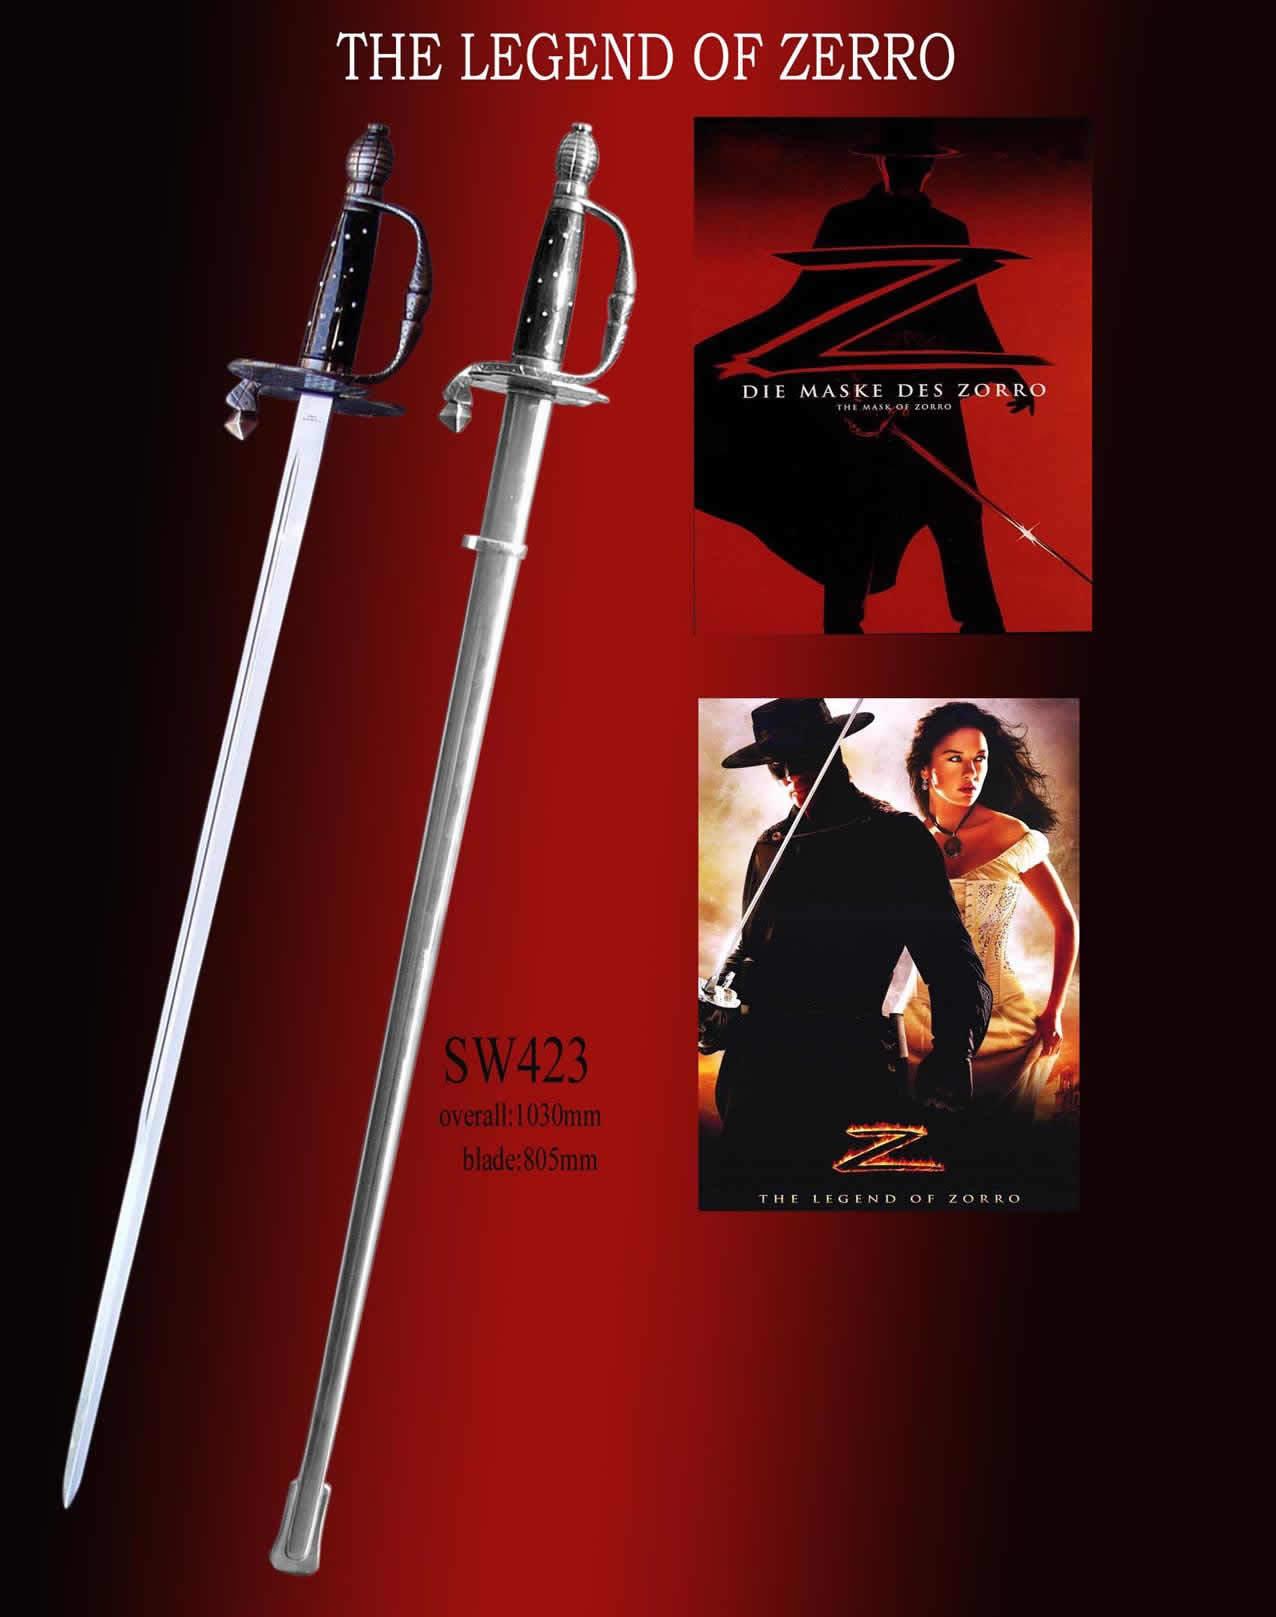 Sword of Zorro movie